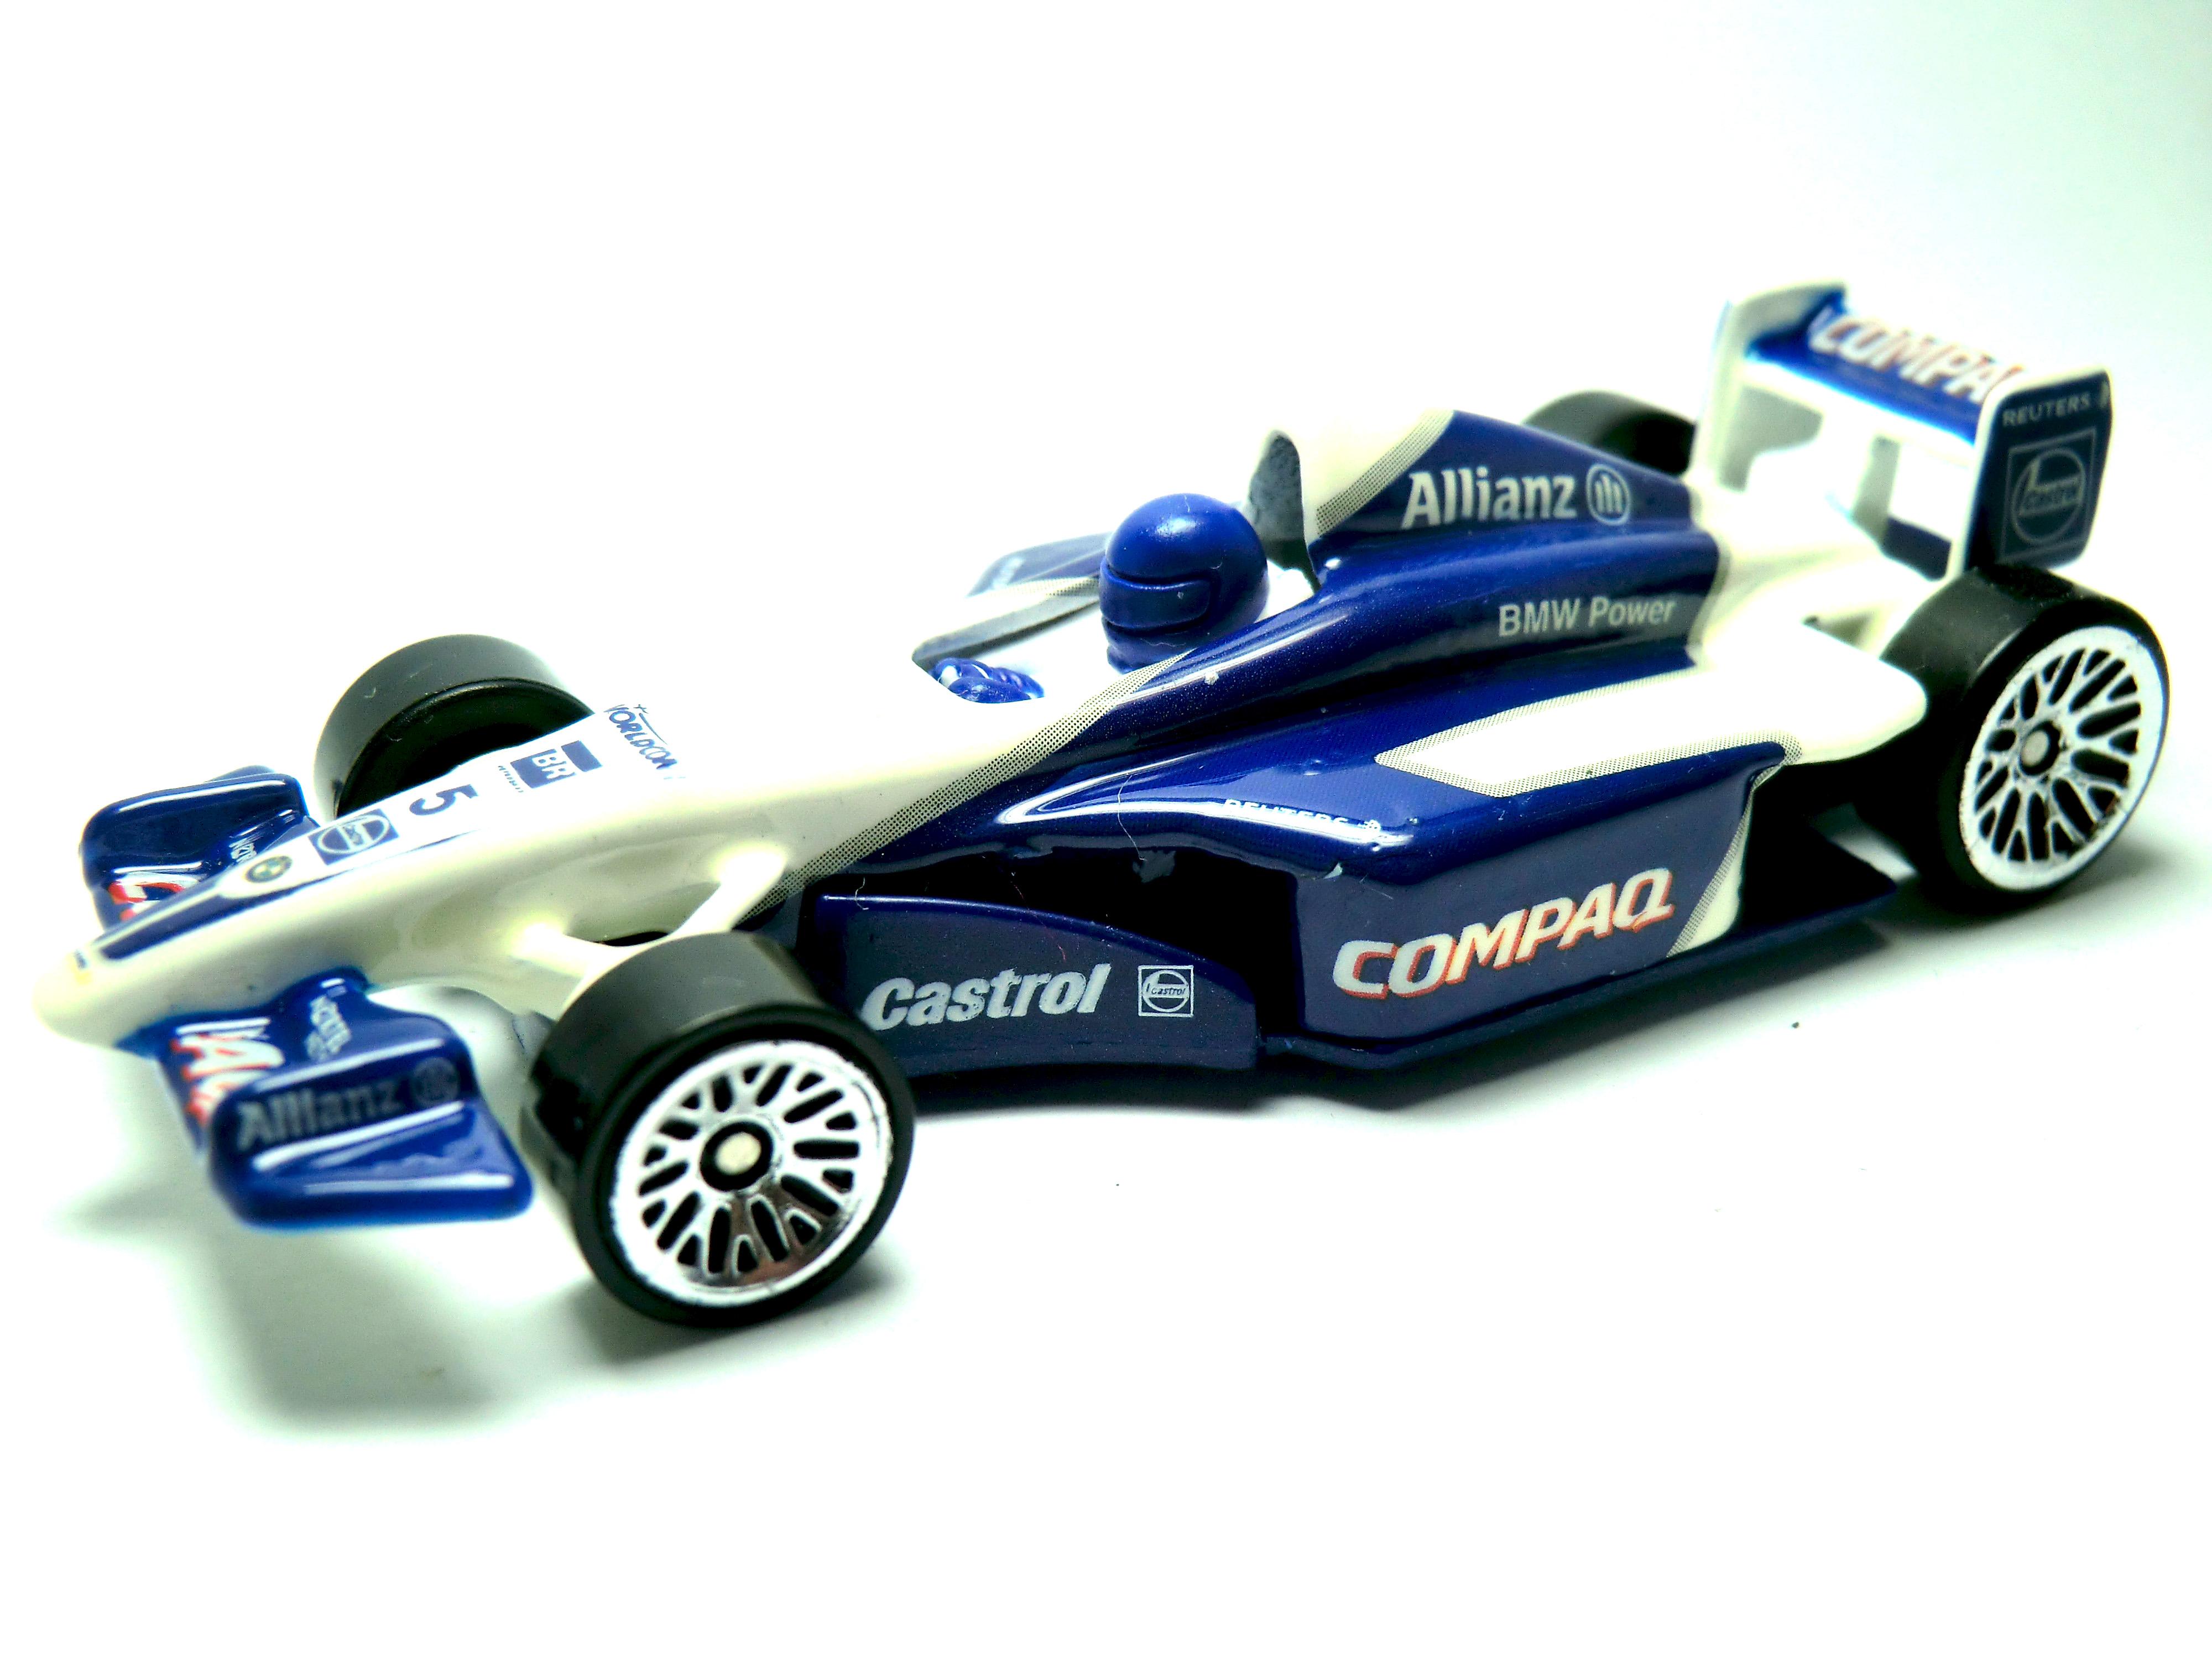 Gp 2009 Hot Wheels Wiki